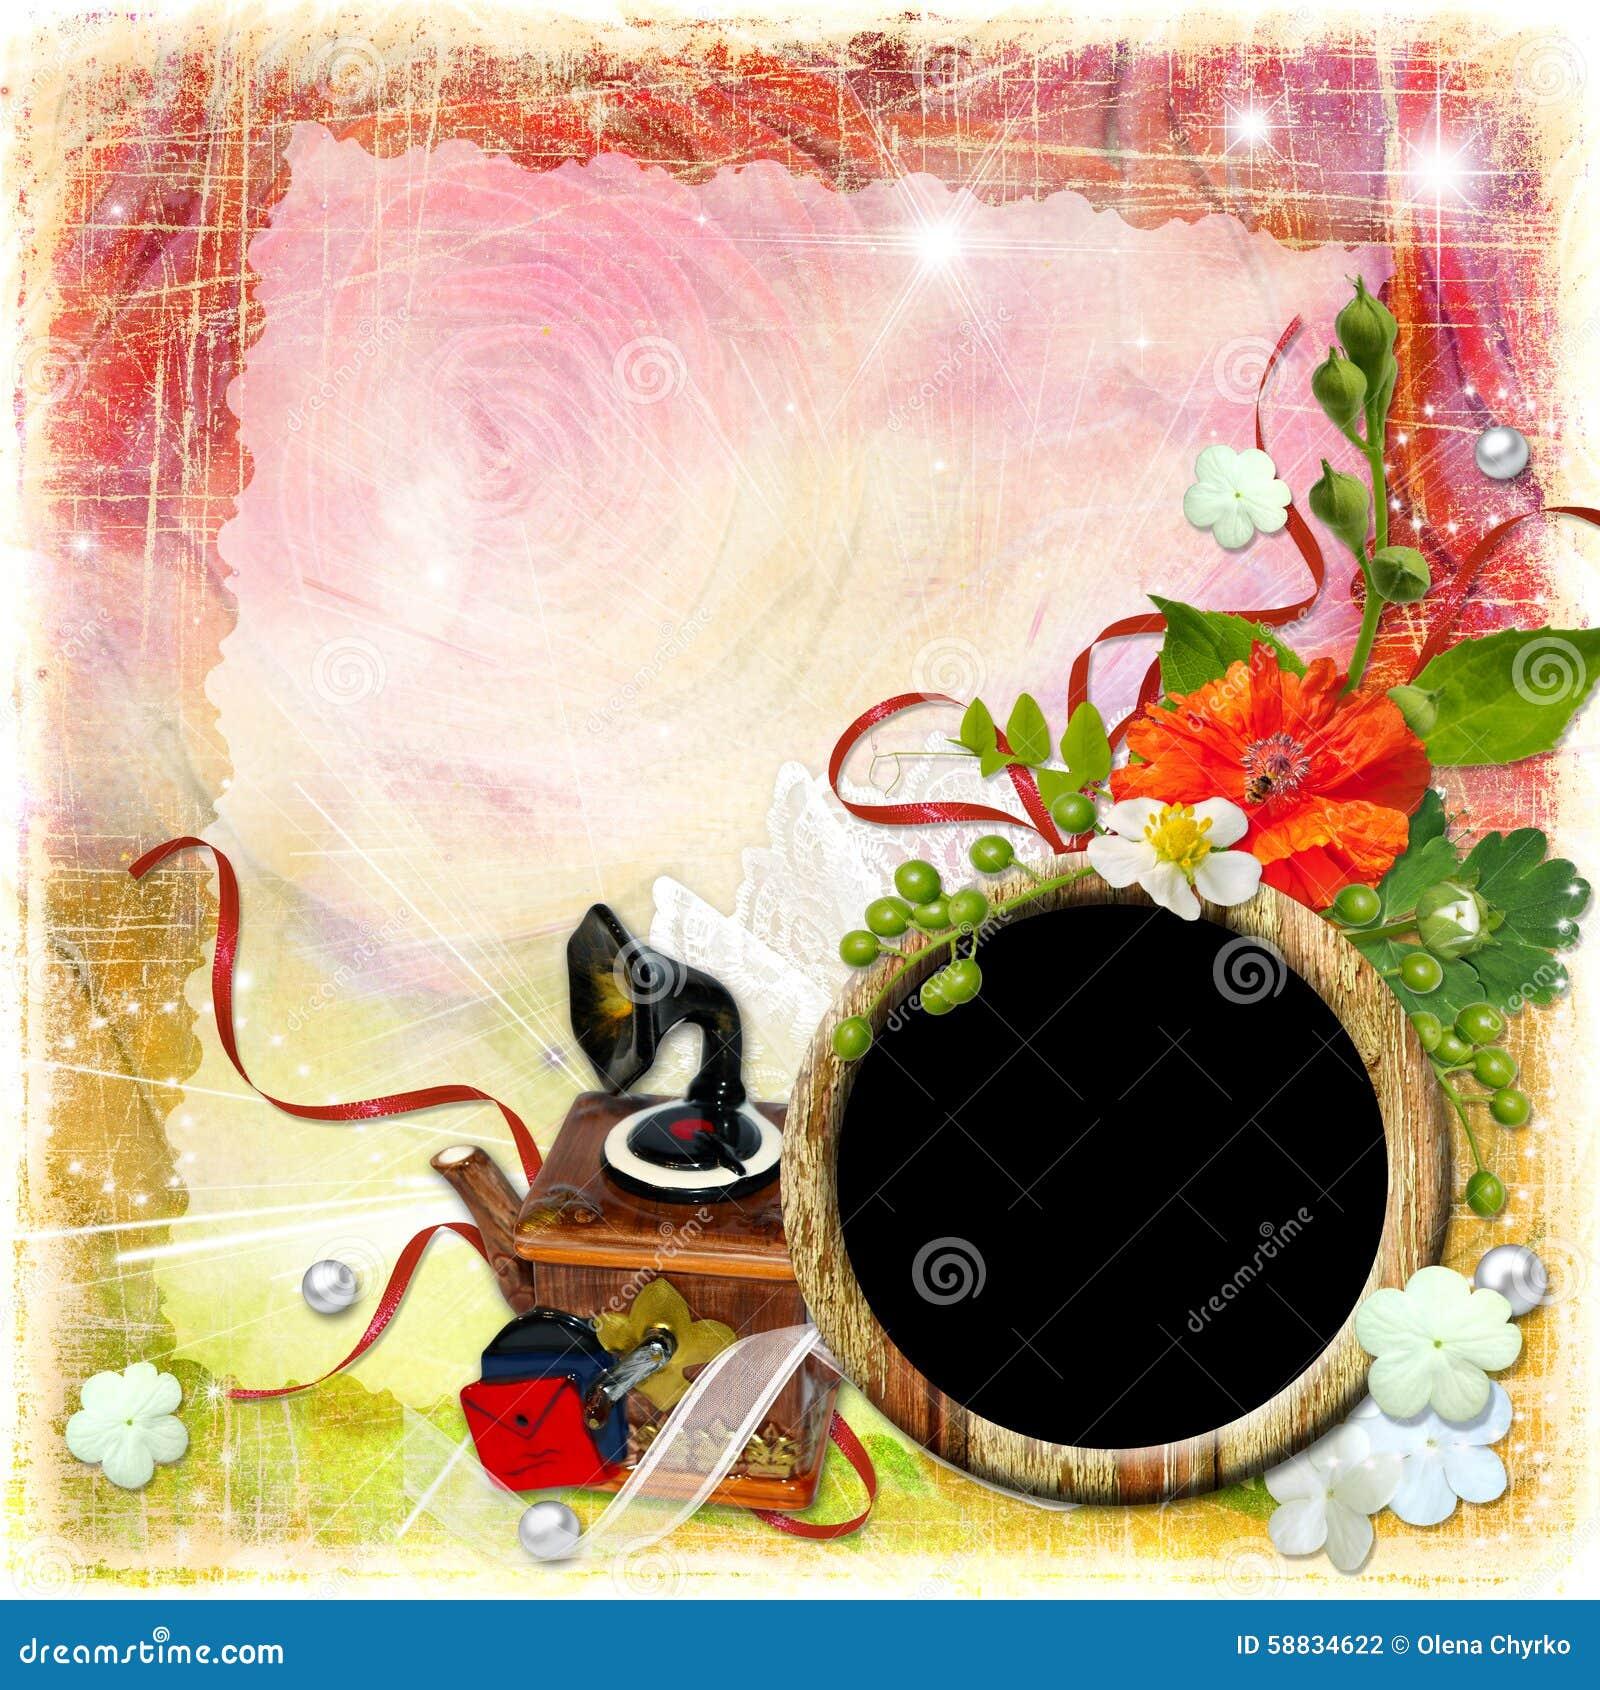 grunge textured background with framework and flowers stock illustration image 58834622. Black Bedroom Furniture Sets. Home Design Ideas